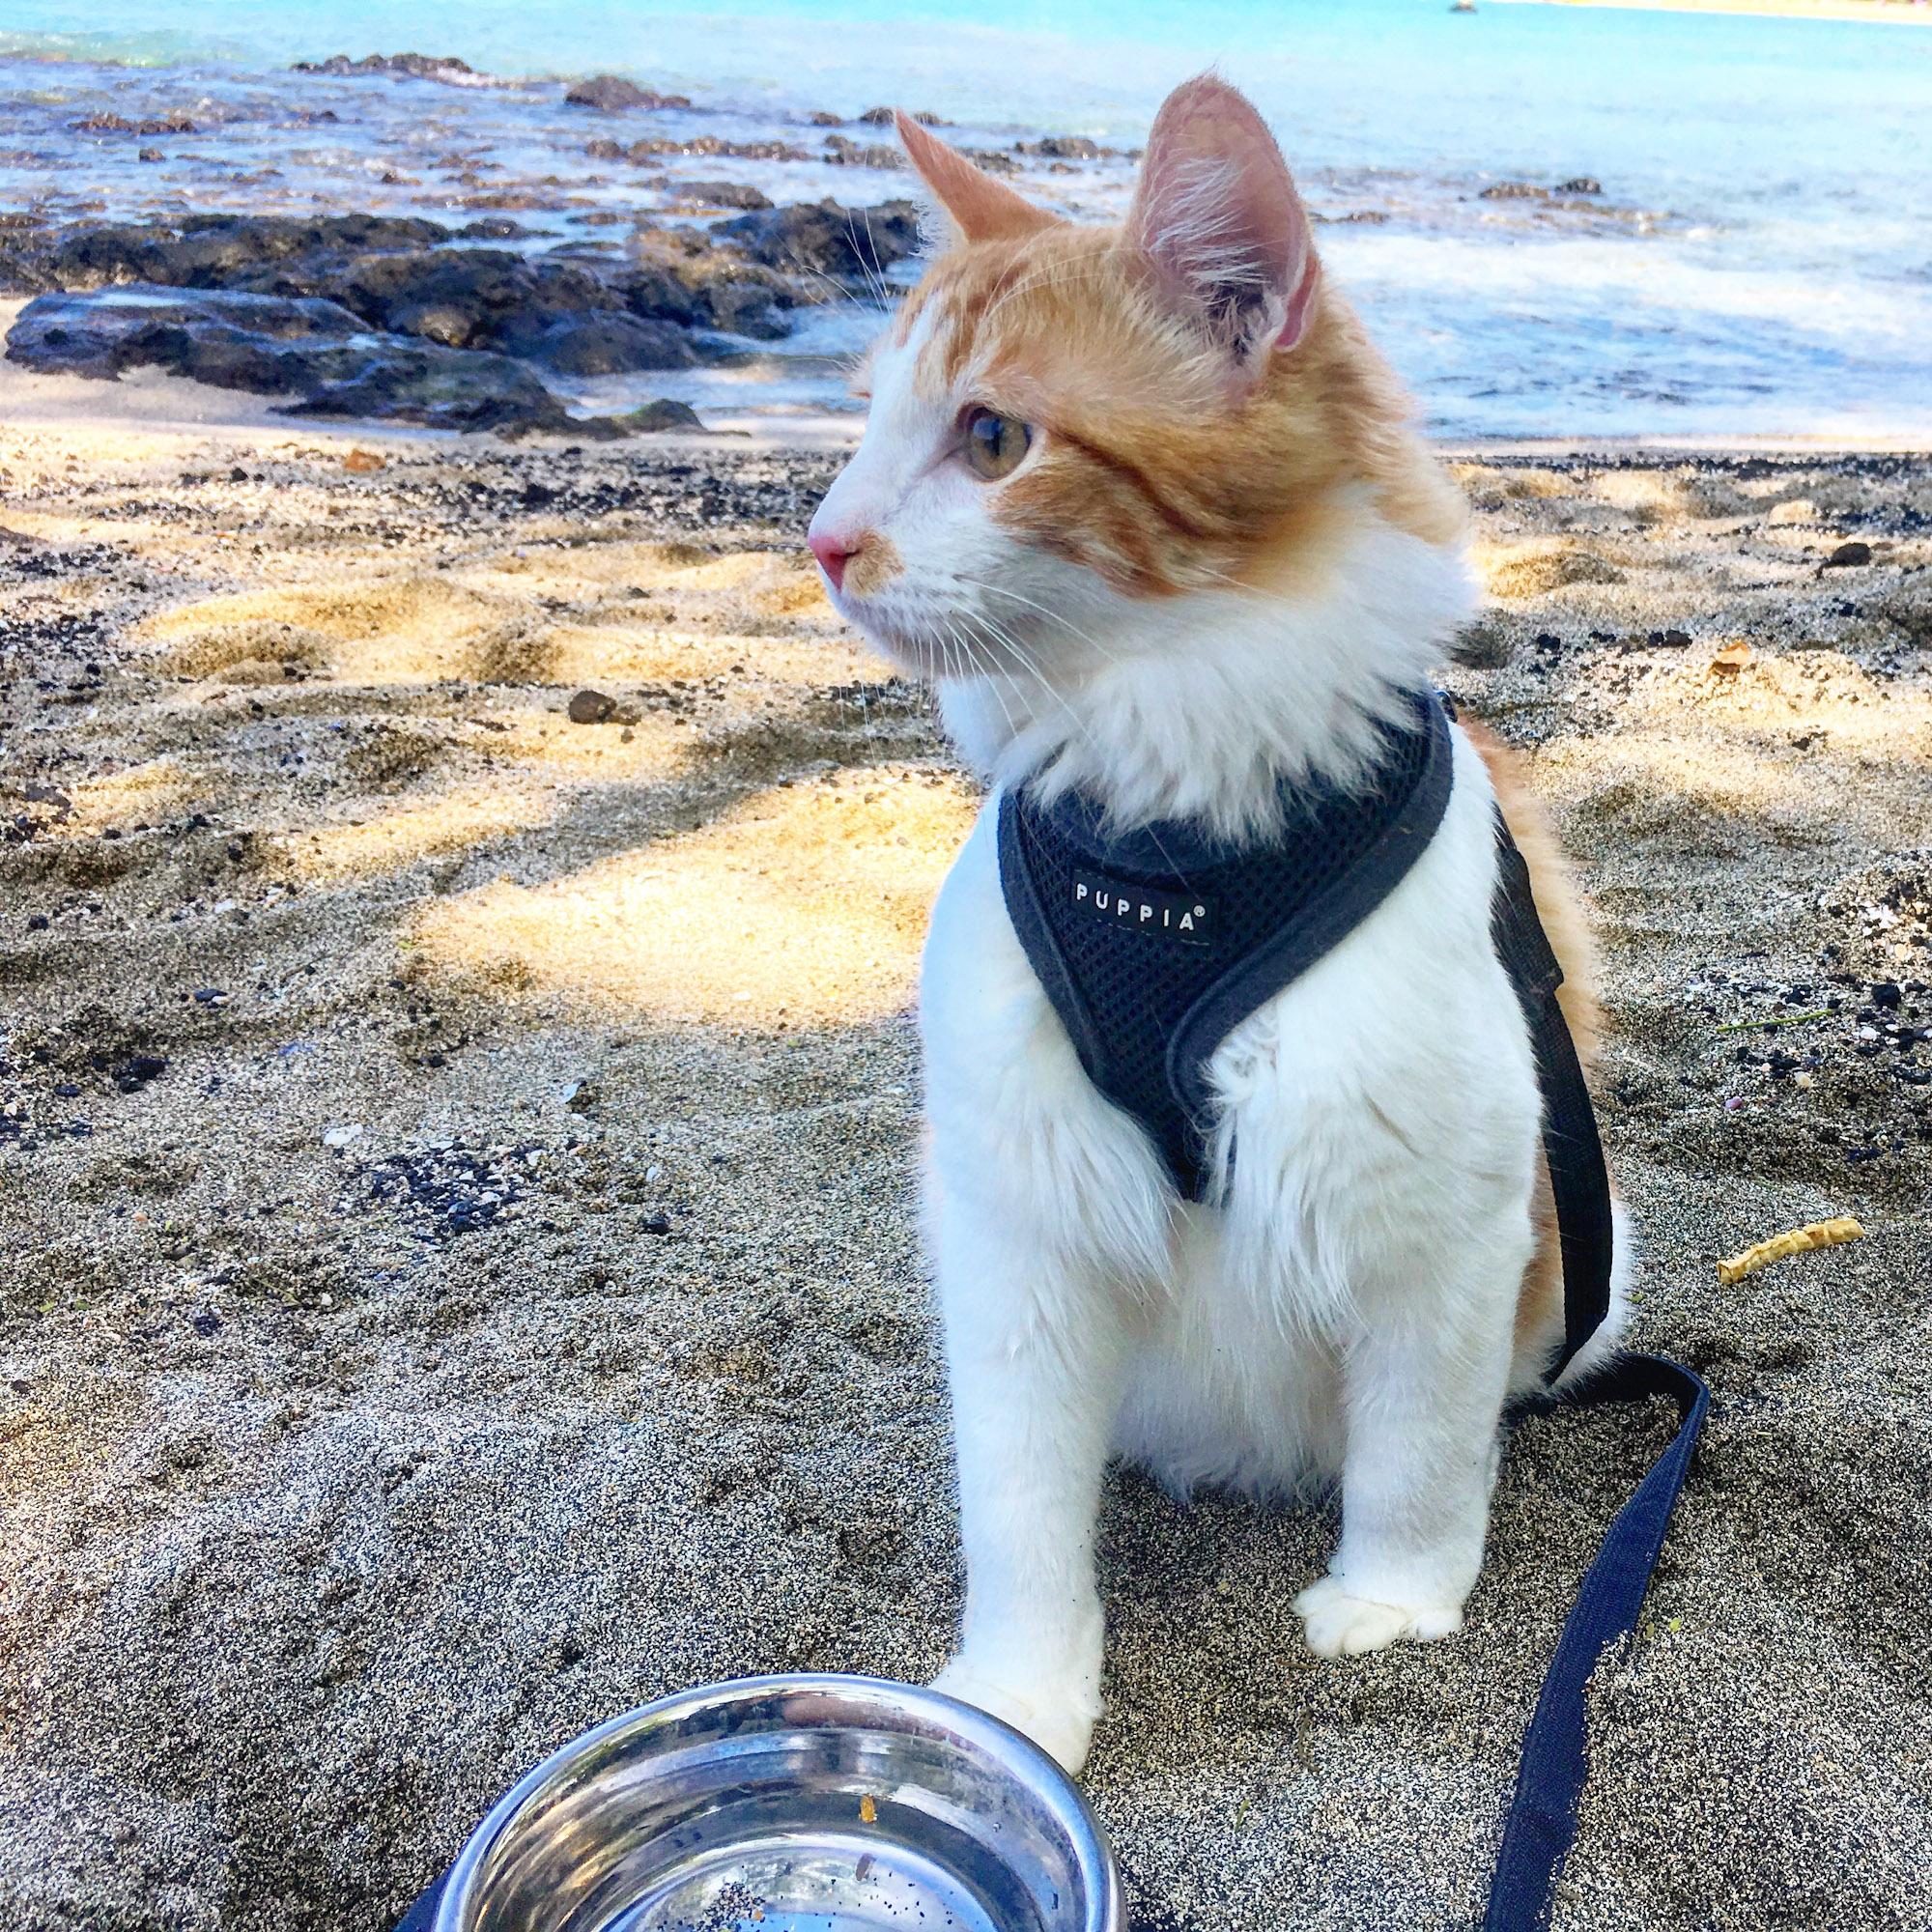 advneture cat on beach